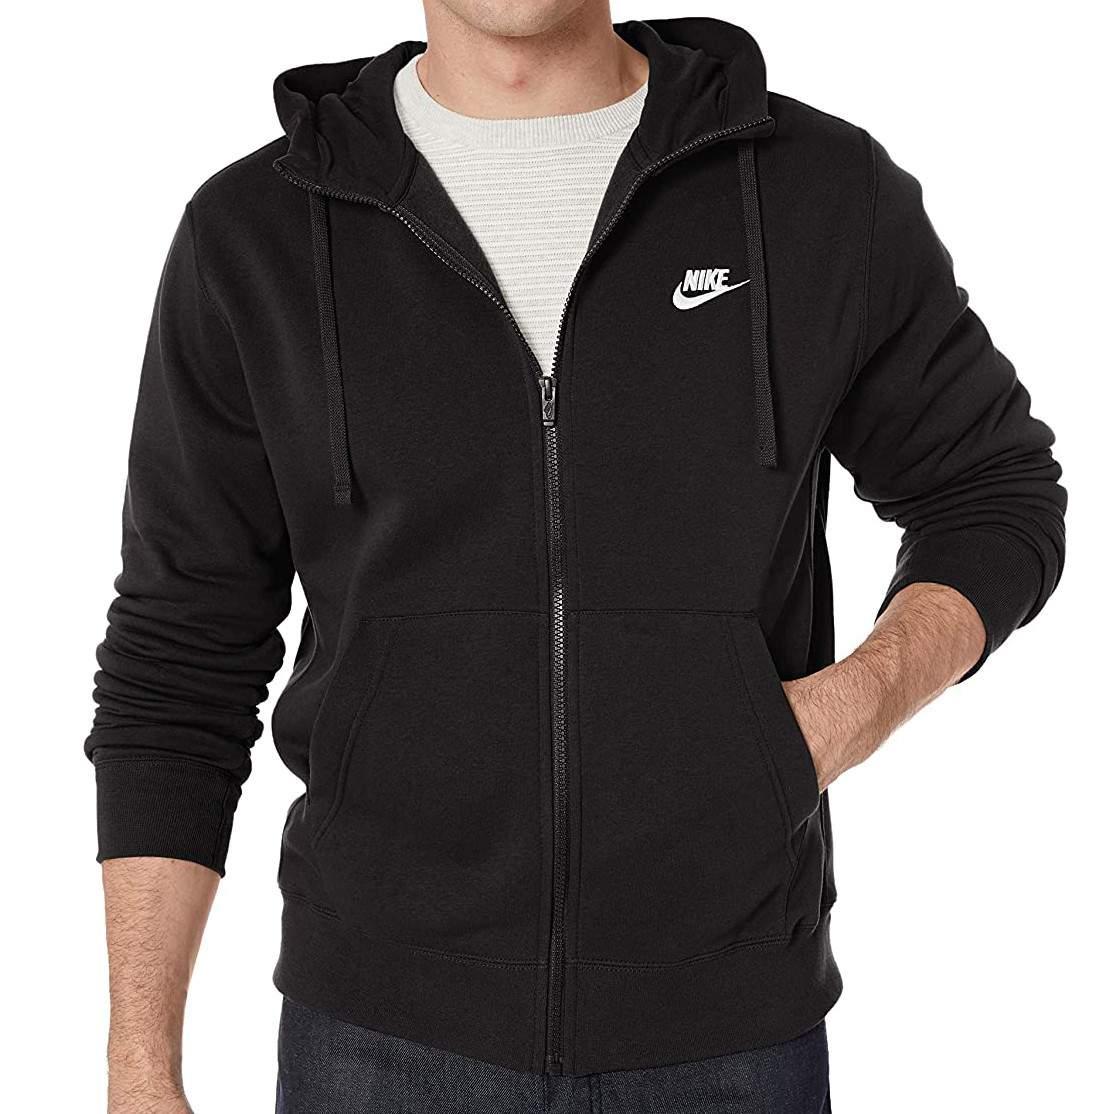 Nike Kabátok webshop, 2020 as trendek | ShopAlike